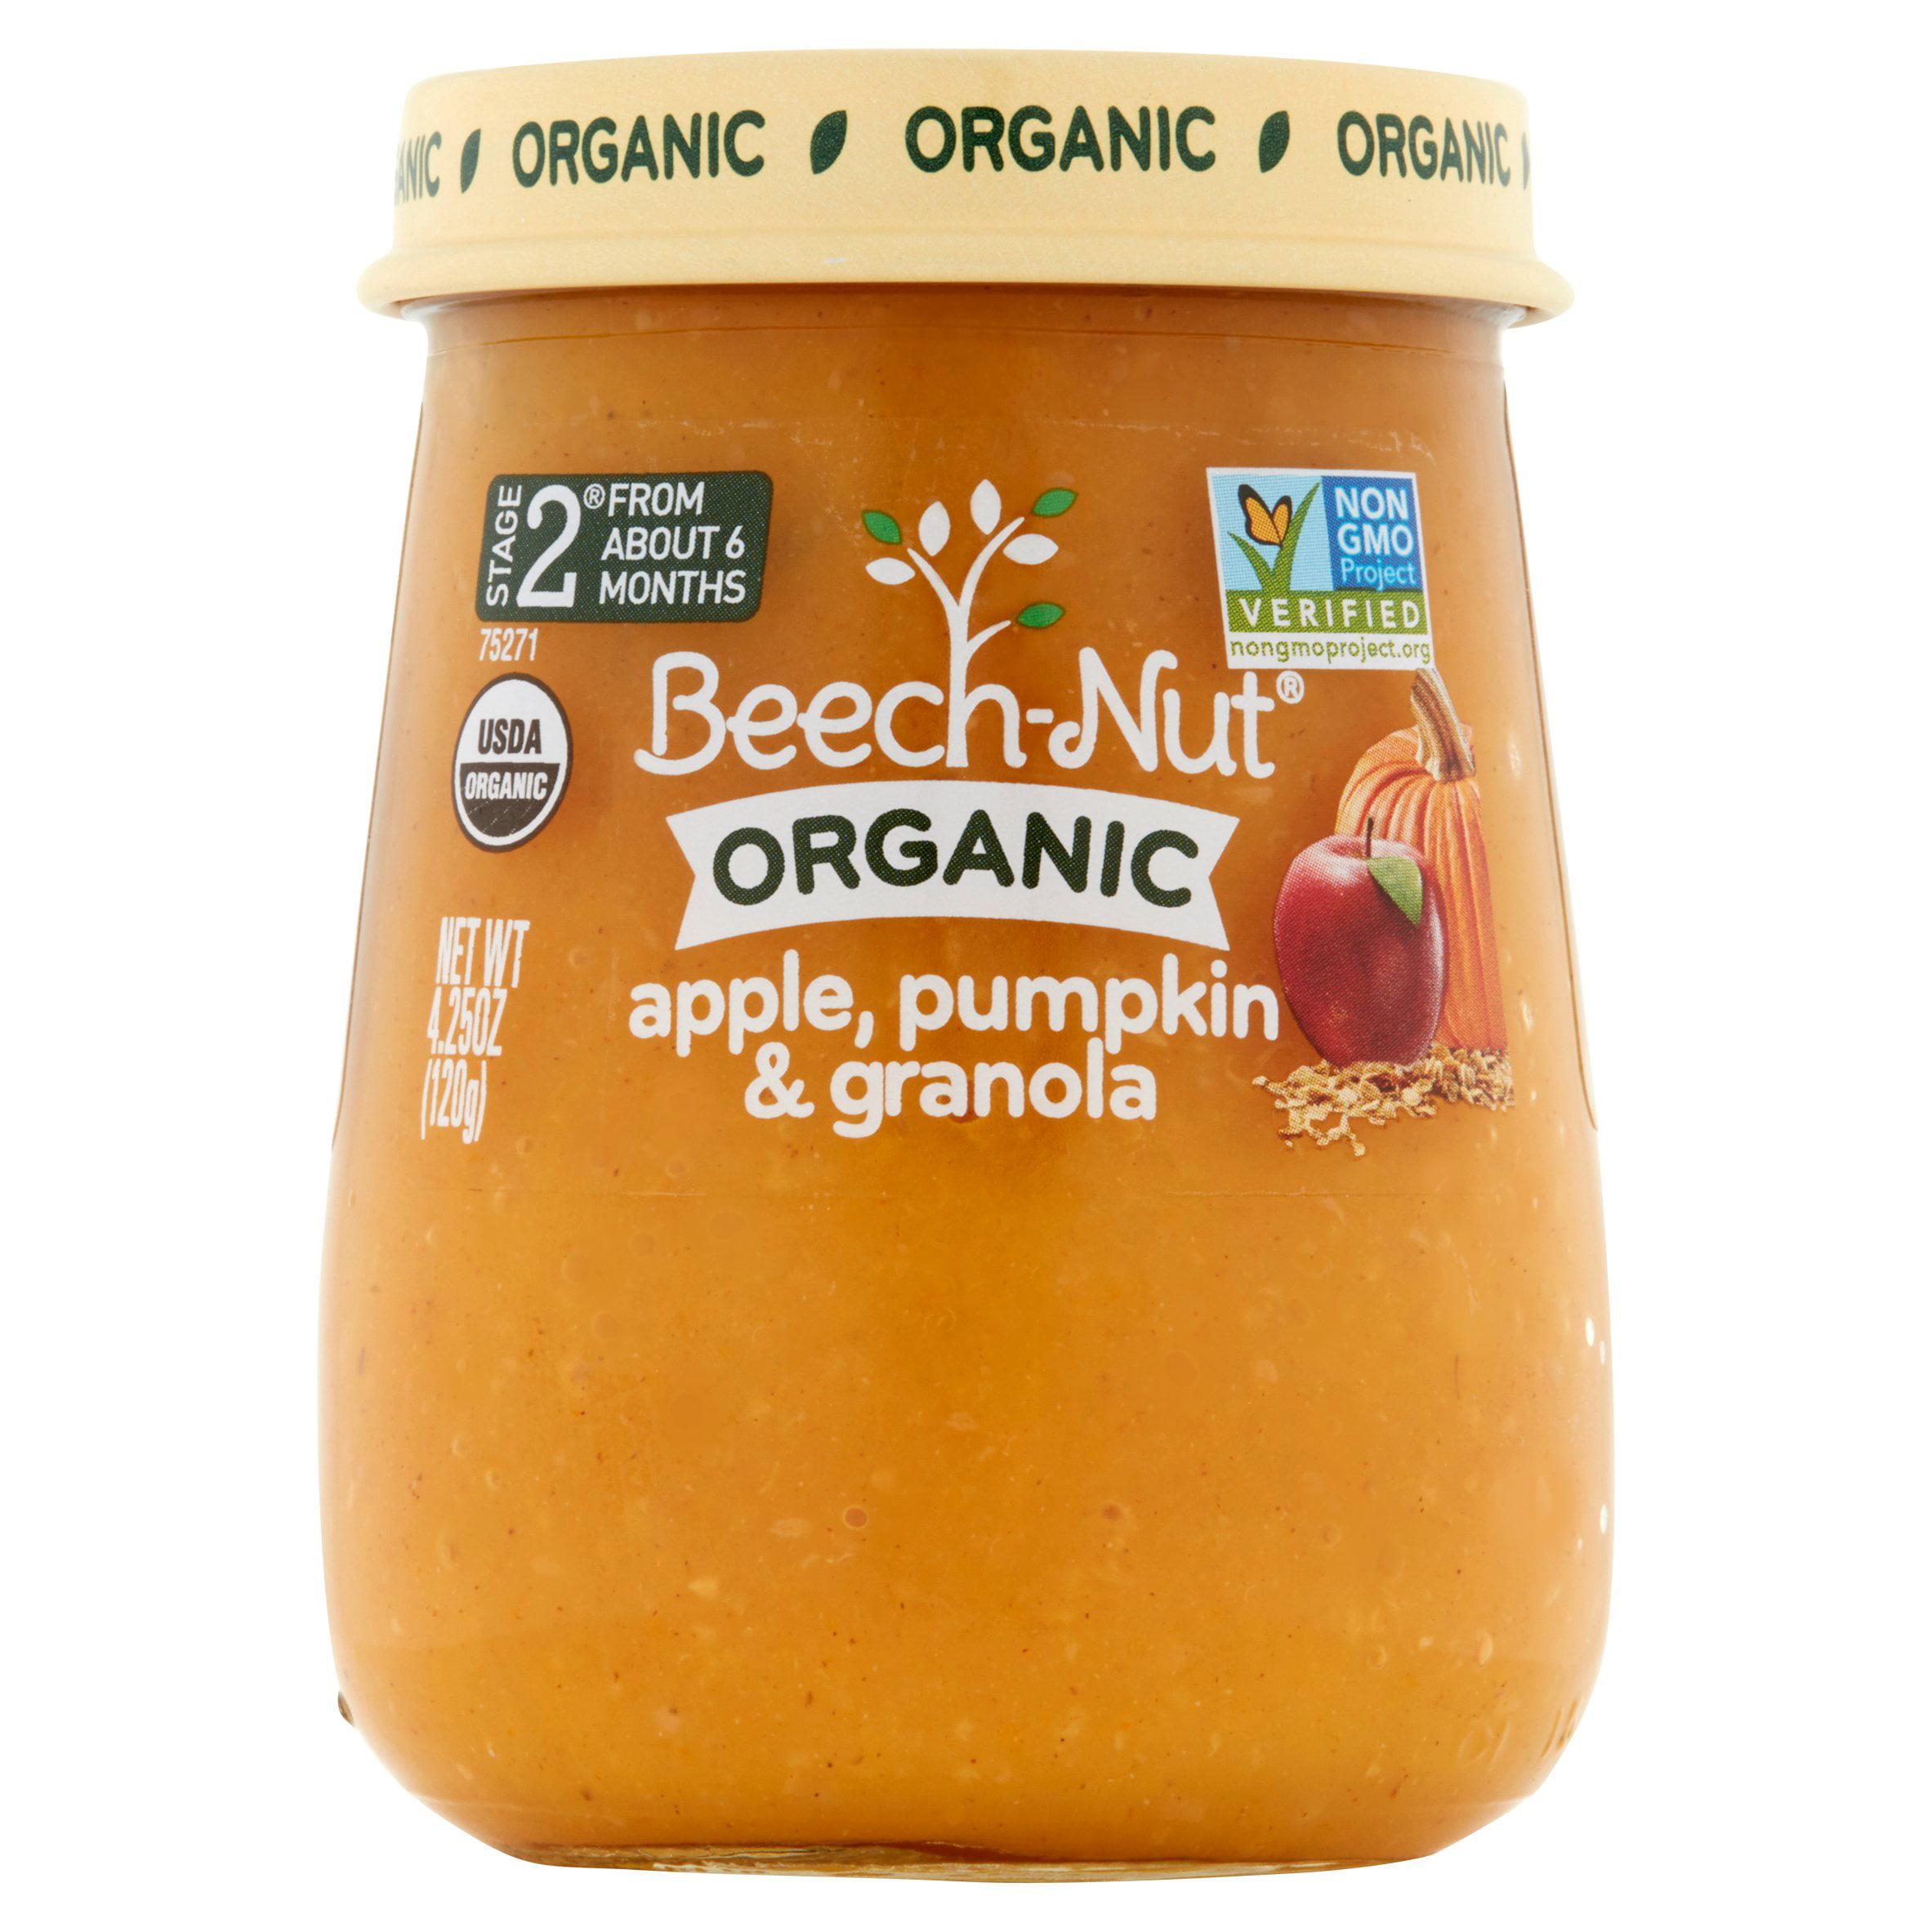 Beech-Nut Organic Stage 2 Apple, Pumpkin & Granola Baby Food, 4.25 oz, (Pack of 10)